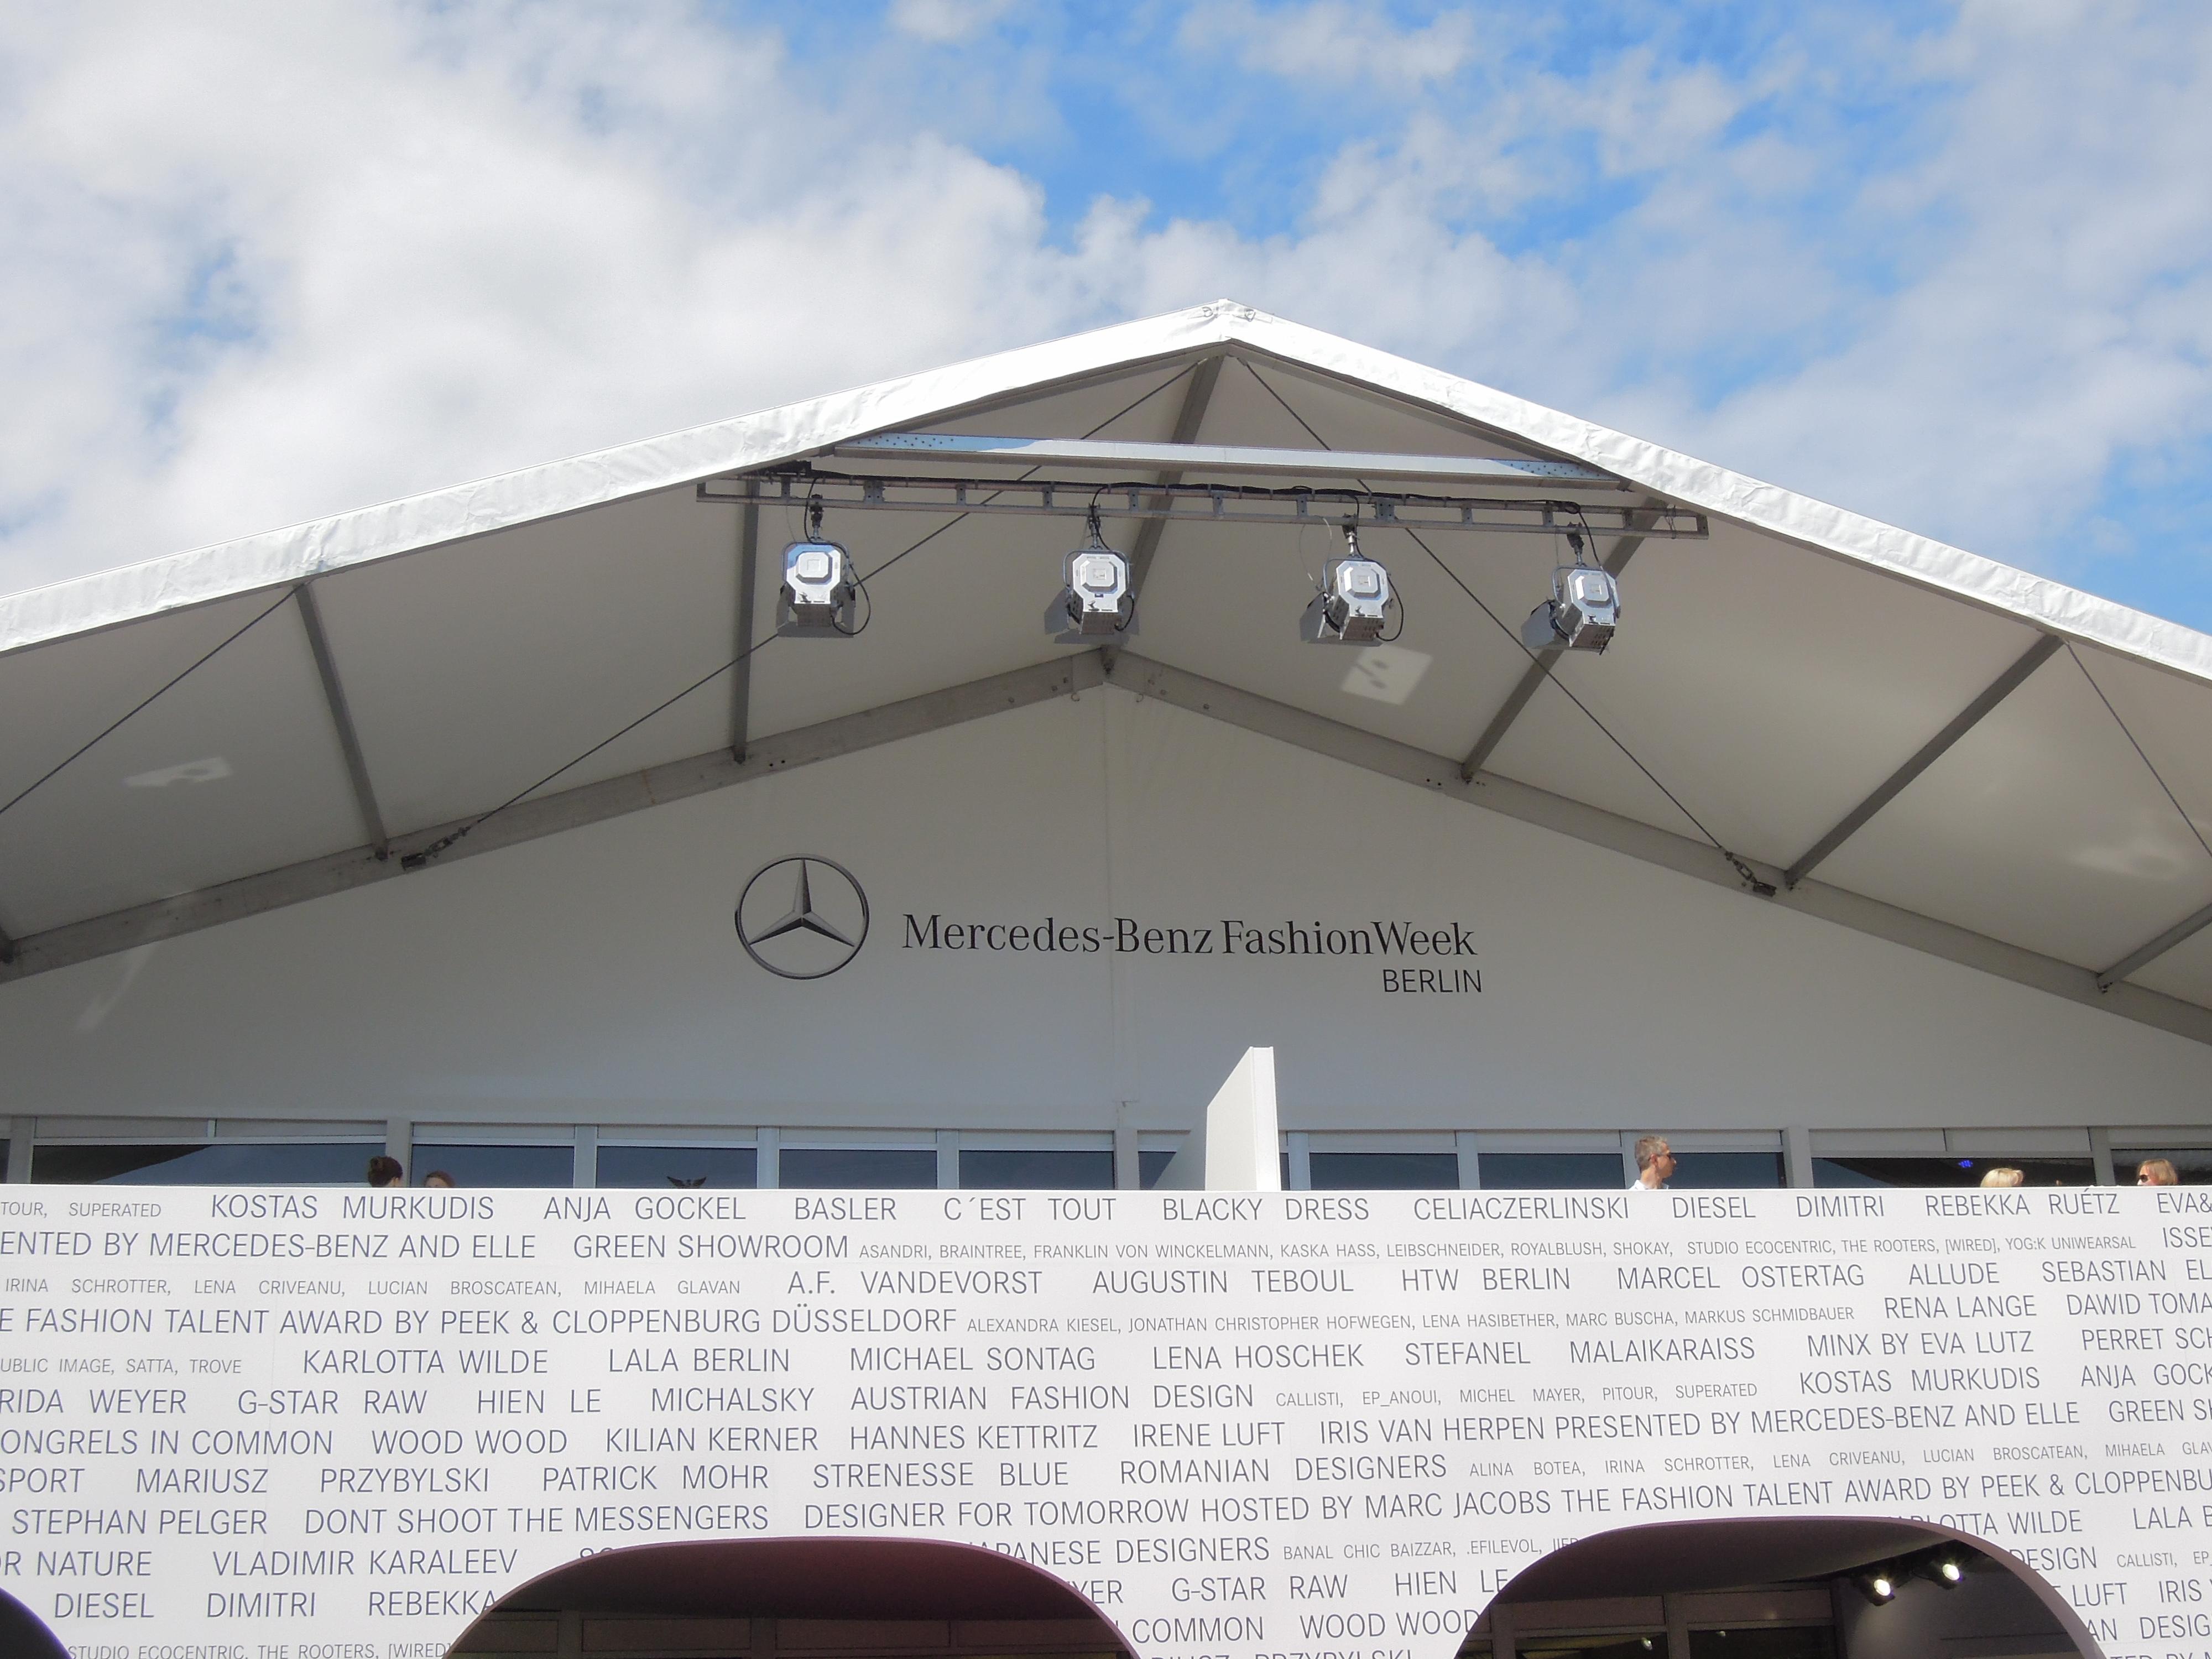 fashionweek tent